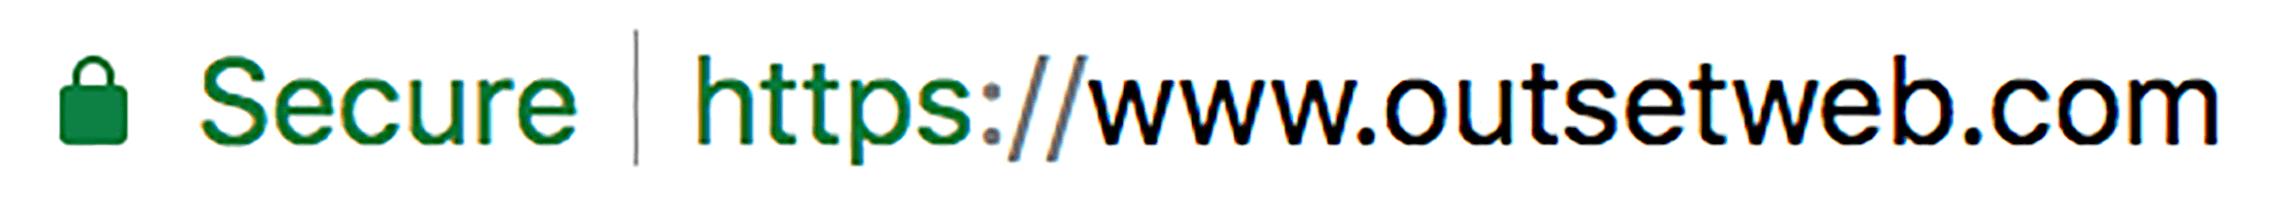 SSL Encryption Padlock